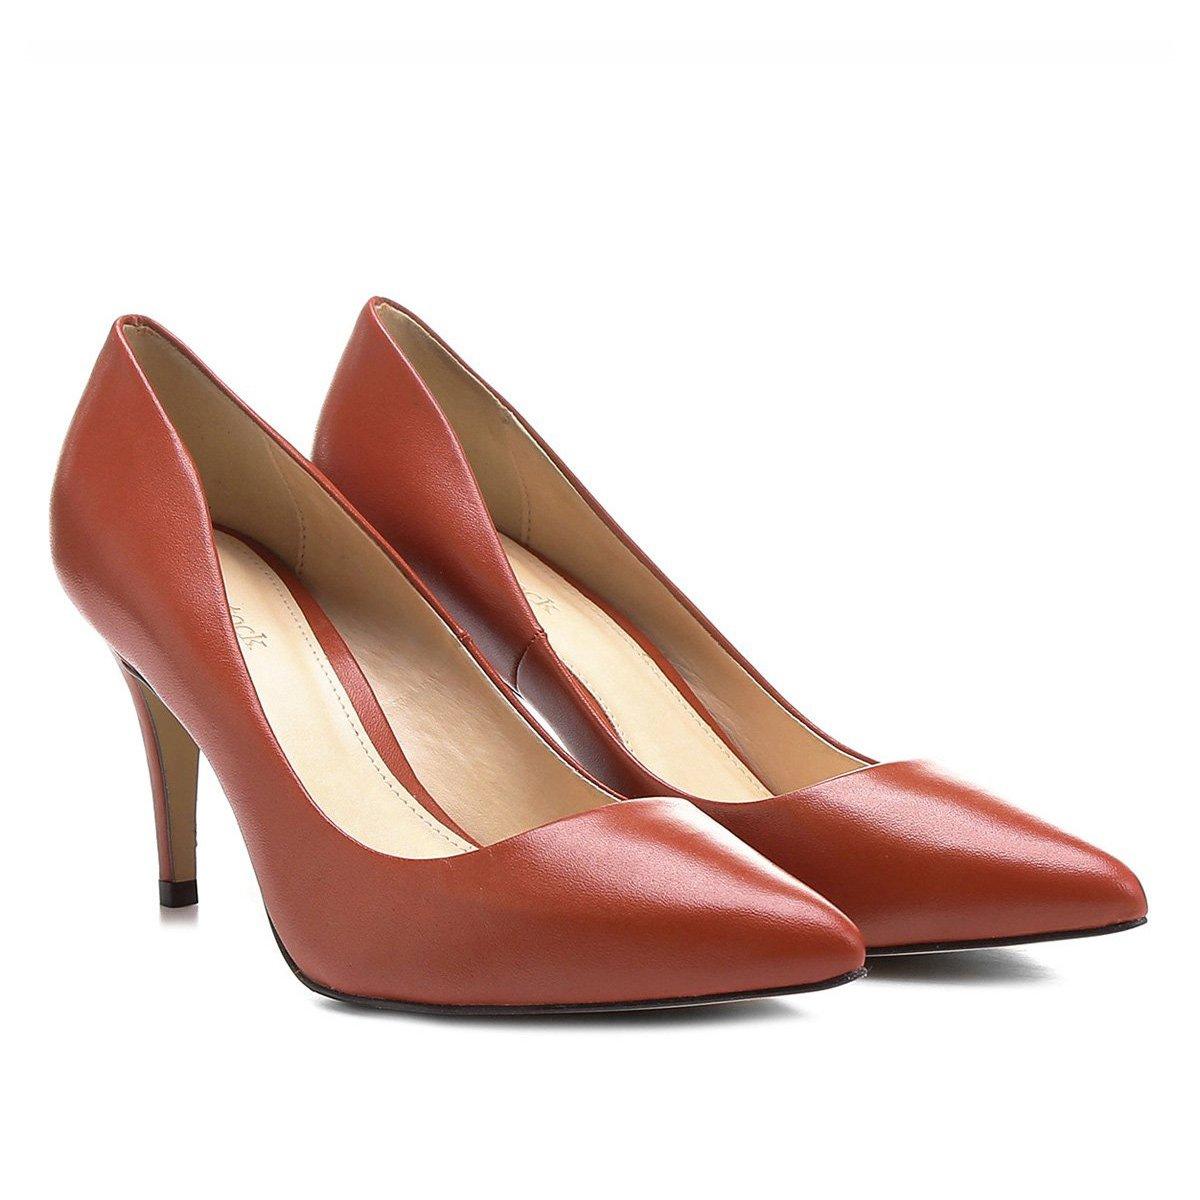 36afec6f20 Scarpin Couro Shoestock Salto Médio Bico Fino - Laranja Escuro ...